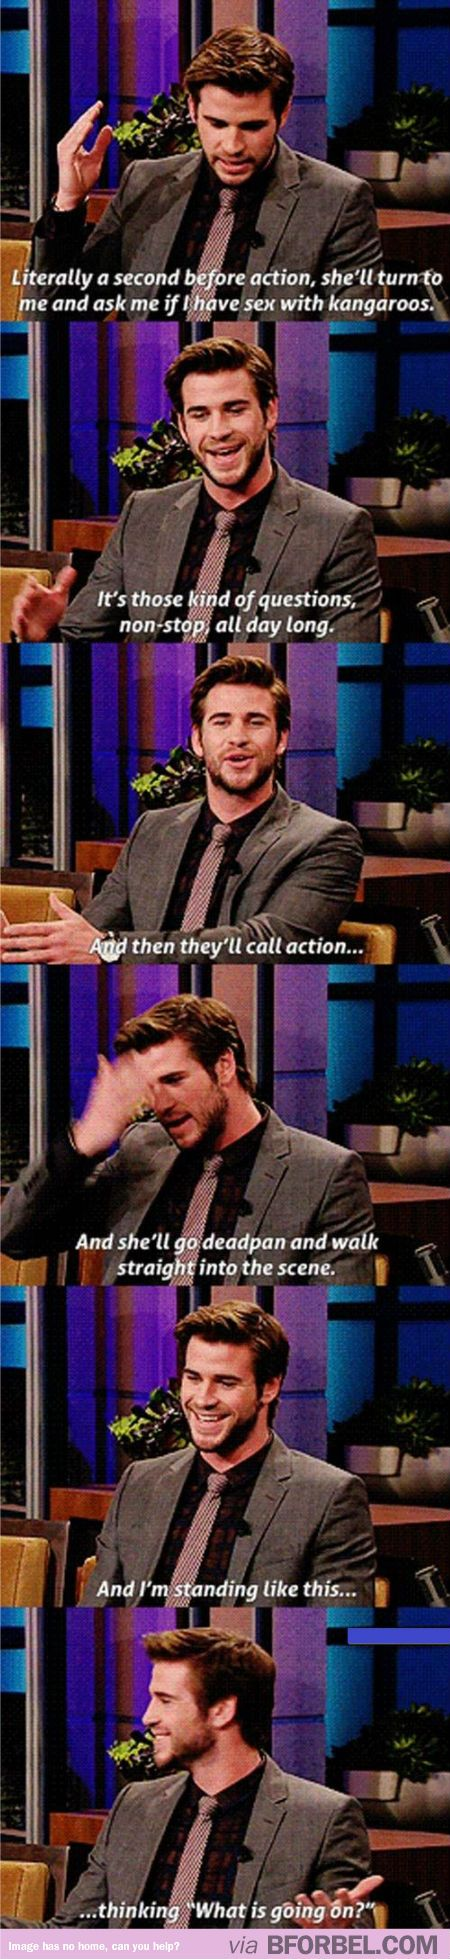 Liam Hemsworth On Working With Jennifer Lawrence… I think I need a Jennifer Lawrence board.